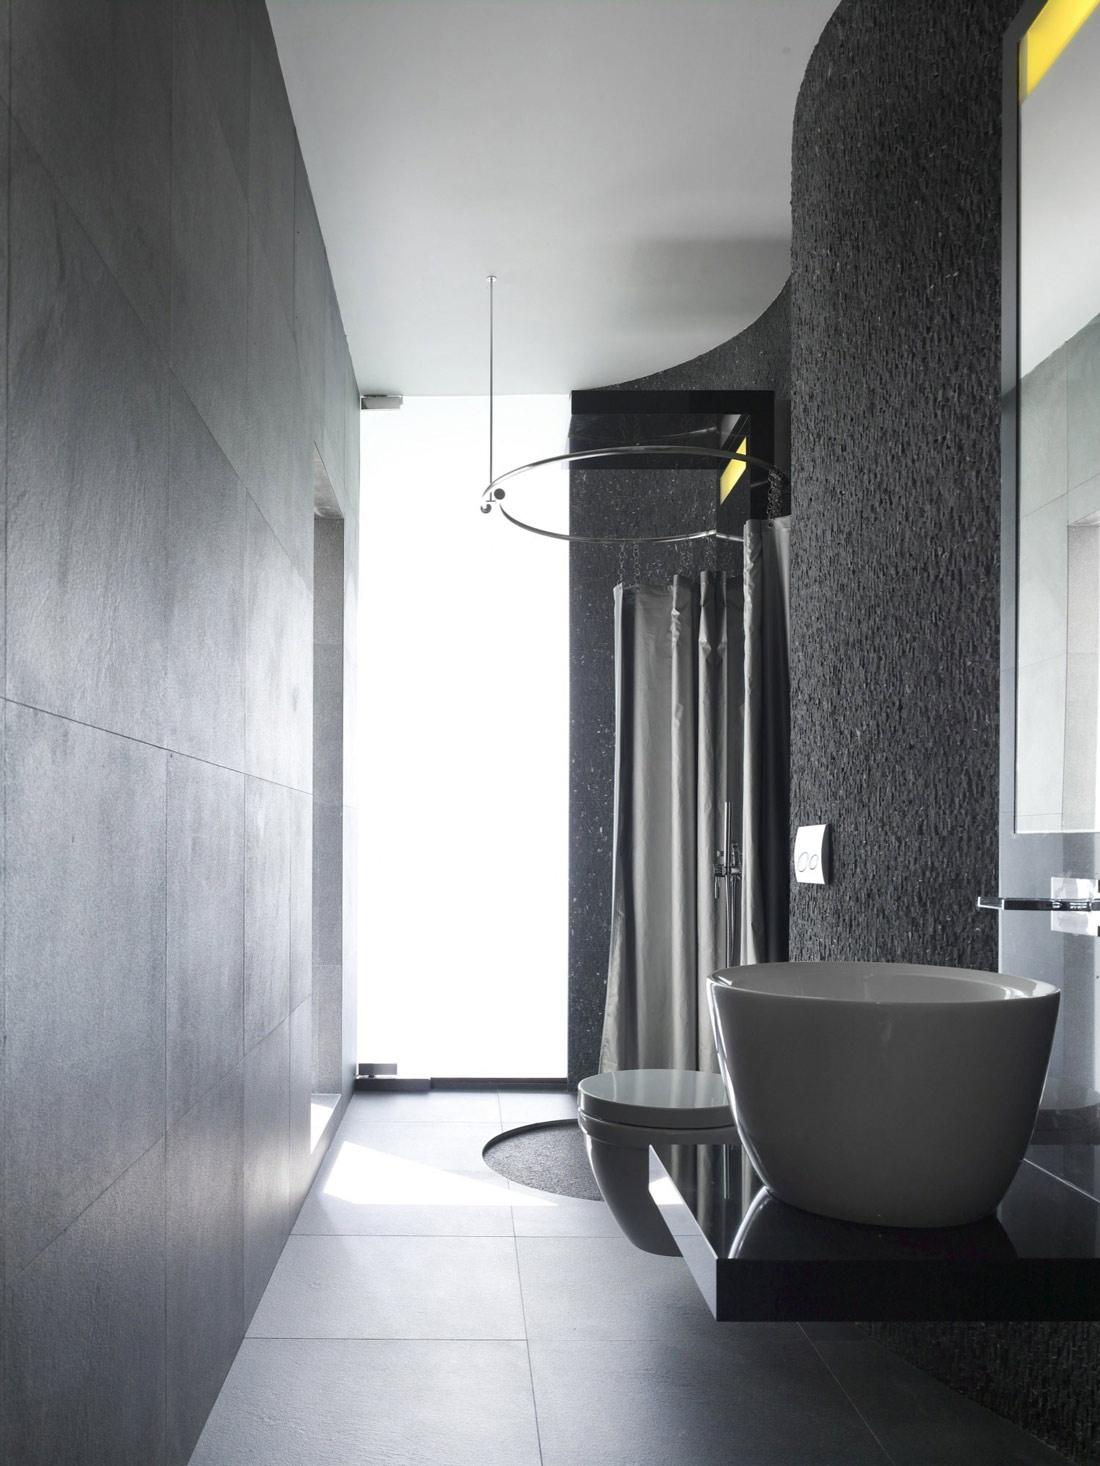 Grey Bathroom, Minimalist Contemporary Home in Singapore